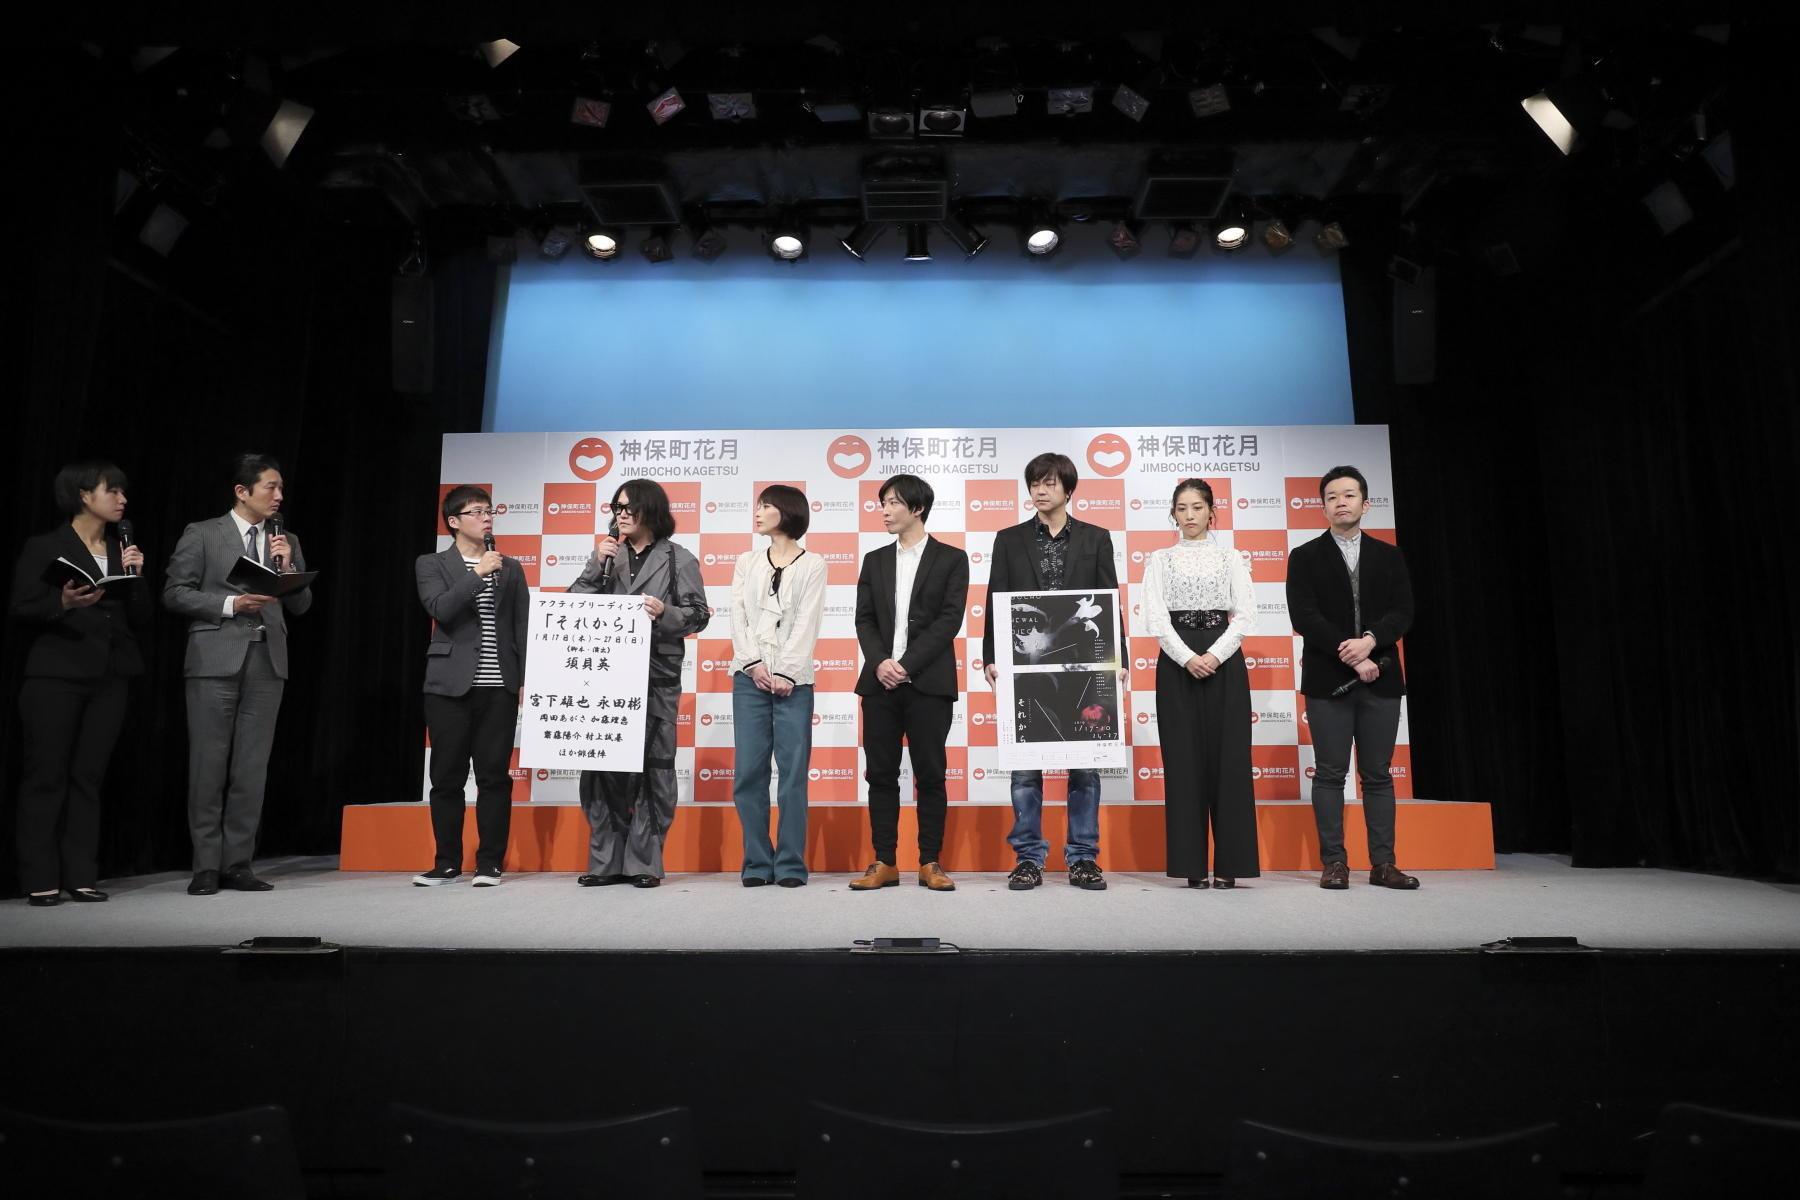 http://news.yoshimoto.co.jp/20181204214019-7017e17d36e9ec2f31dd464230bdff0d78e1f48f.jpg